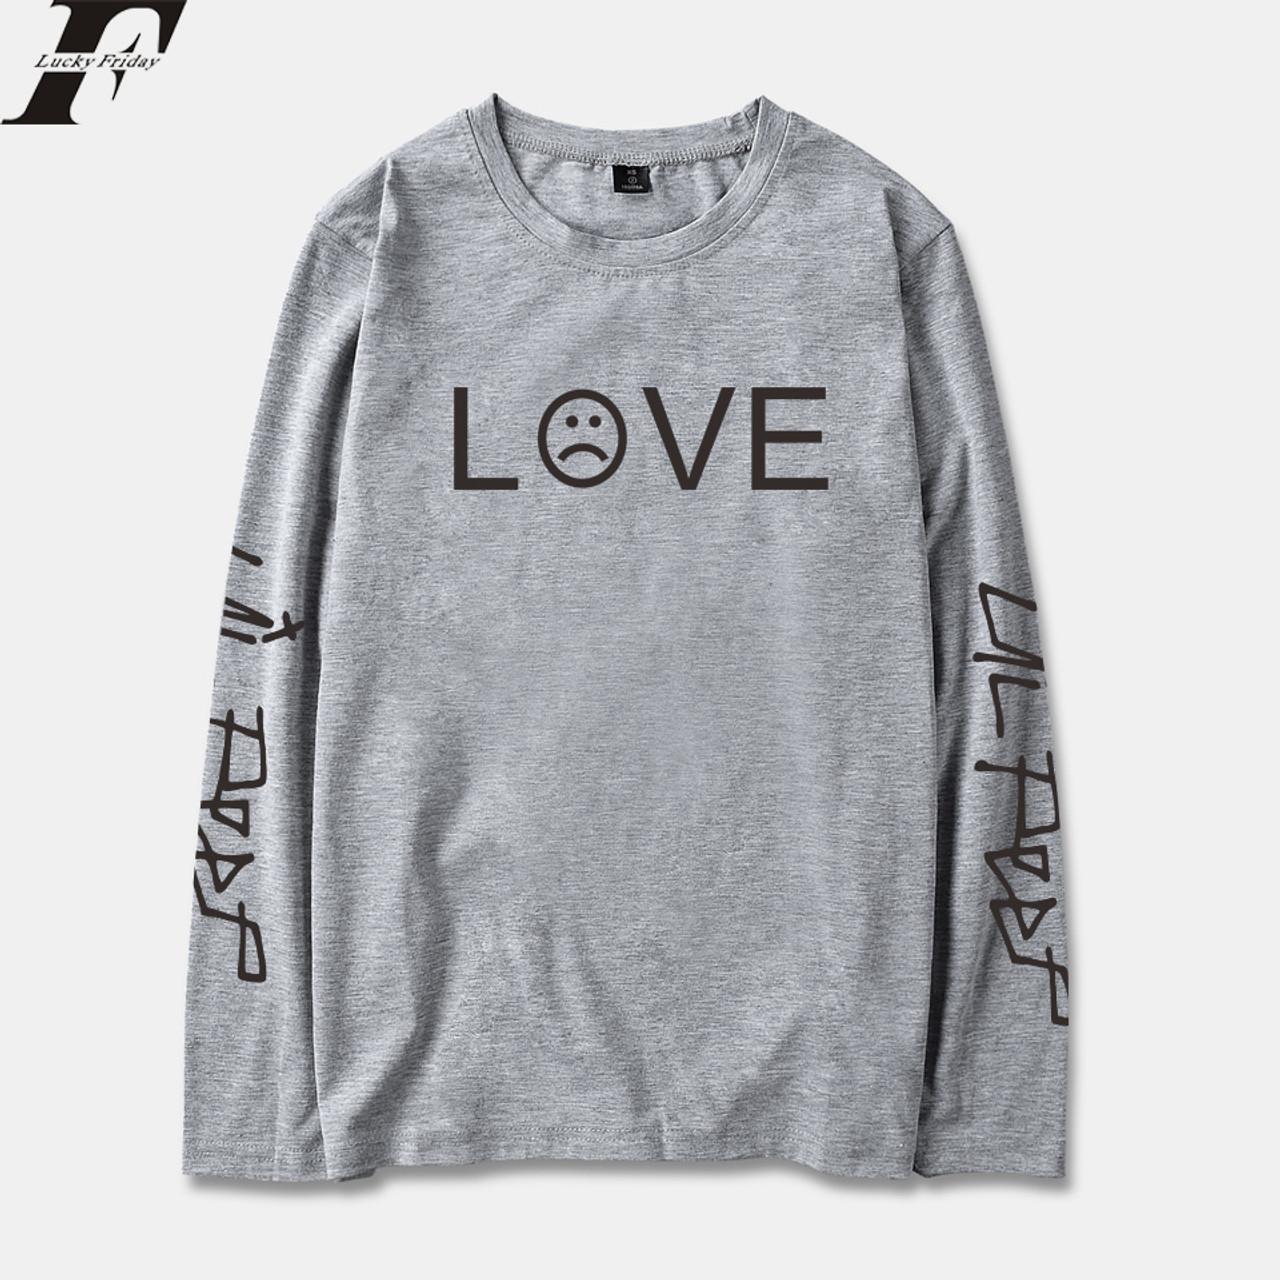 5ce7dd6c6d LUCKYFRIDAYF 2018 Lil Peep R.I.P. Long Sleeve T Shirt Men/Women Cotton  Spring Fashion Casual Streetwear Hip Hop Long T-shirt Top